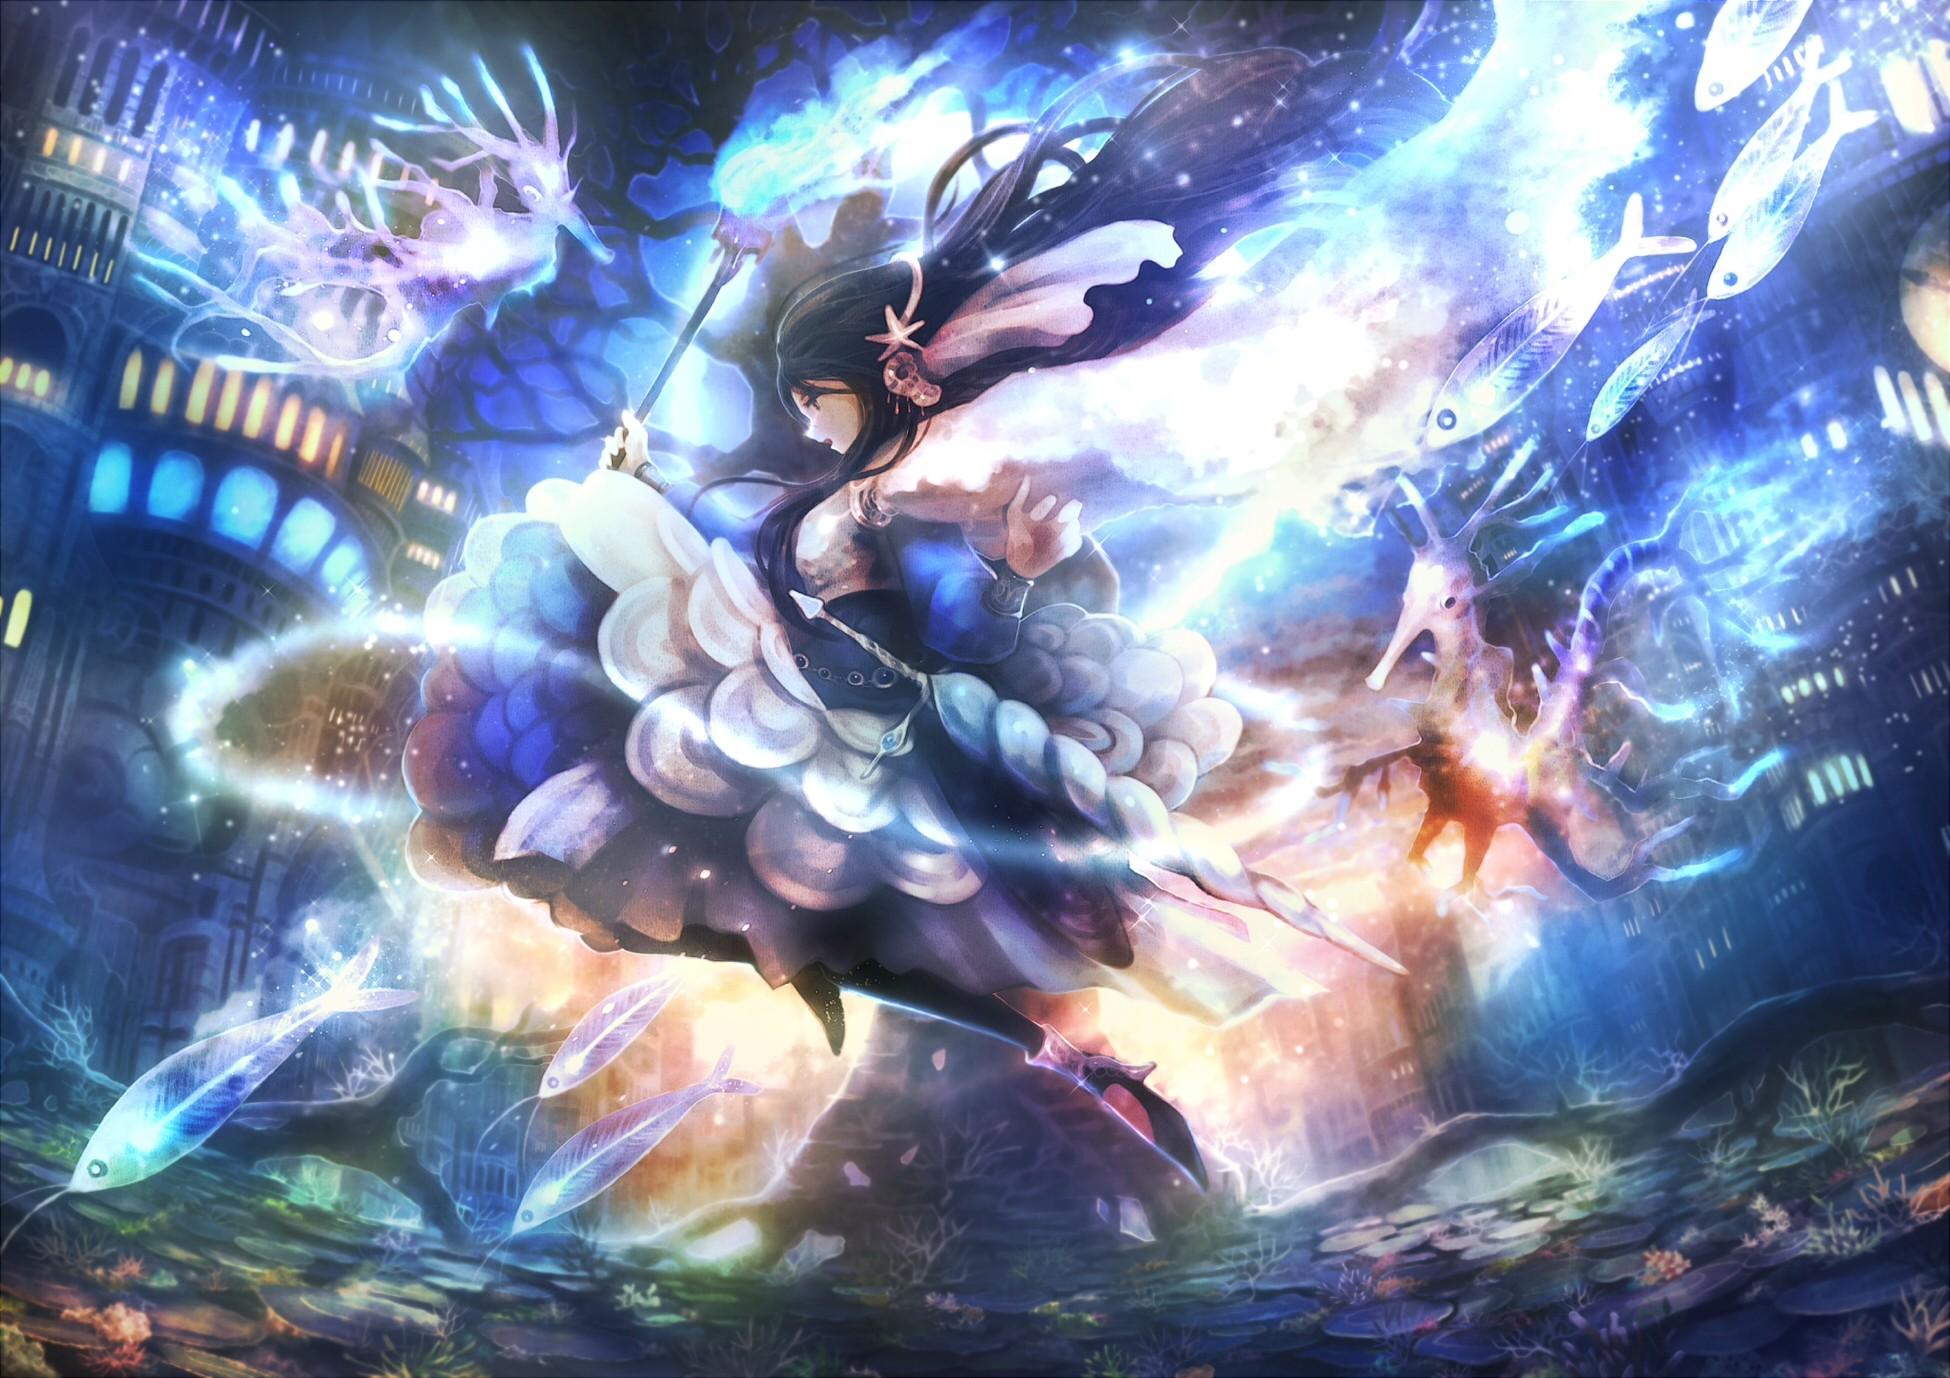 Fond d'écran : Anime, Manga, mythologie, Jeux, capture d ...